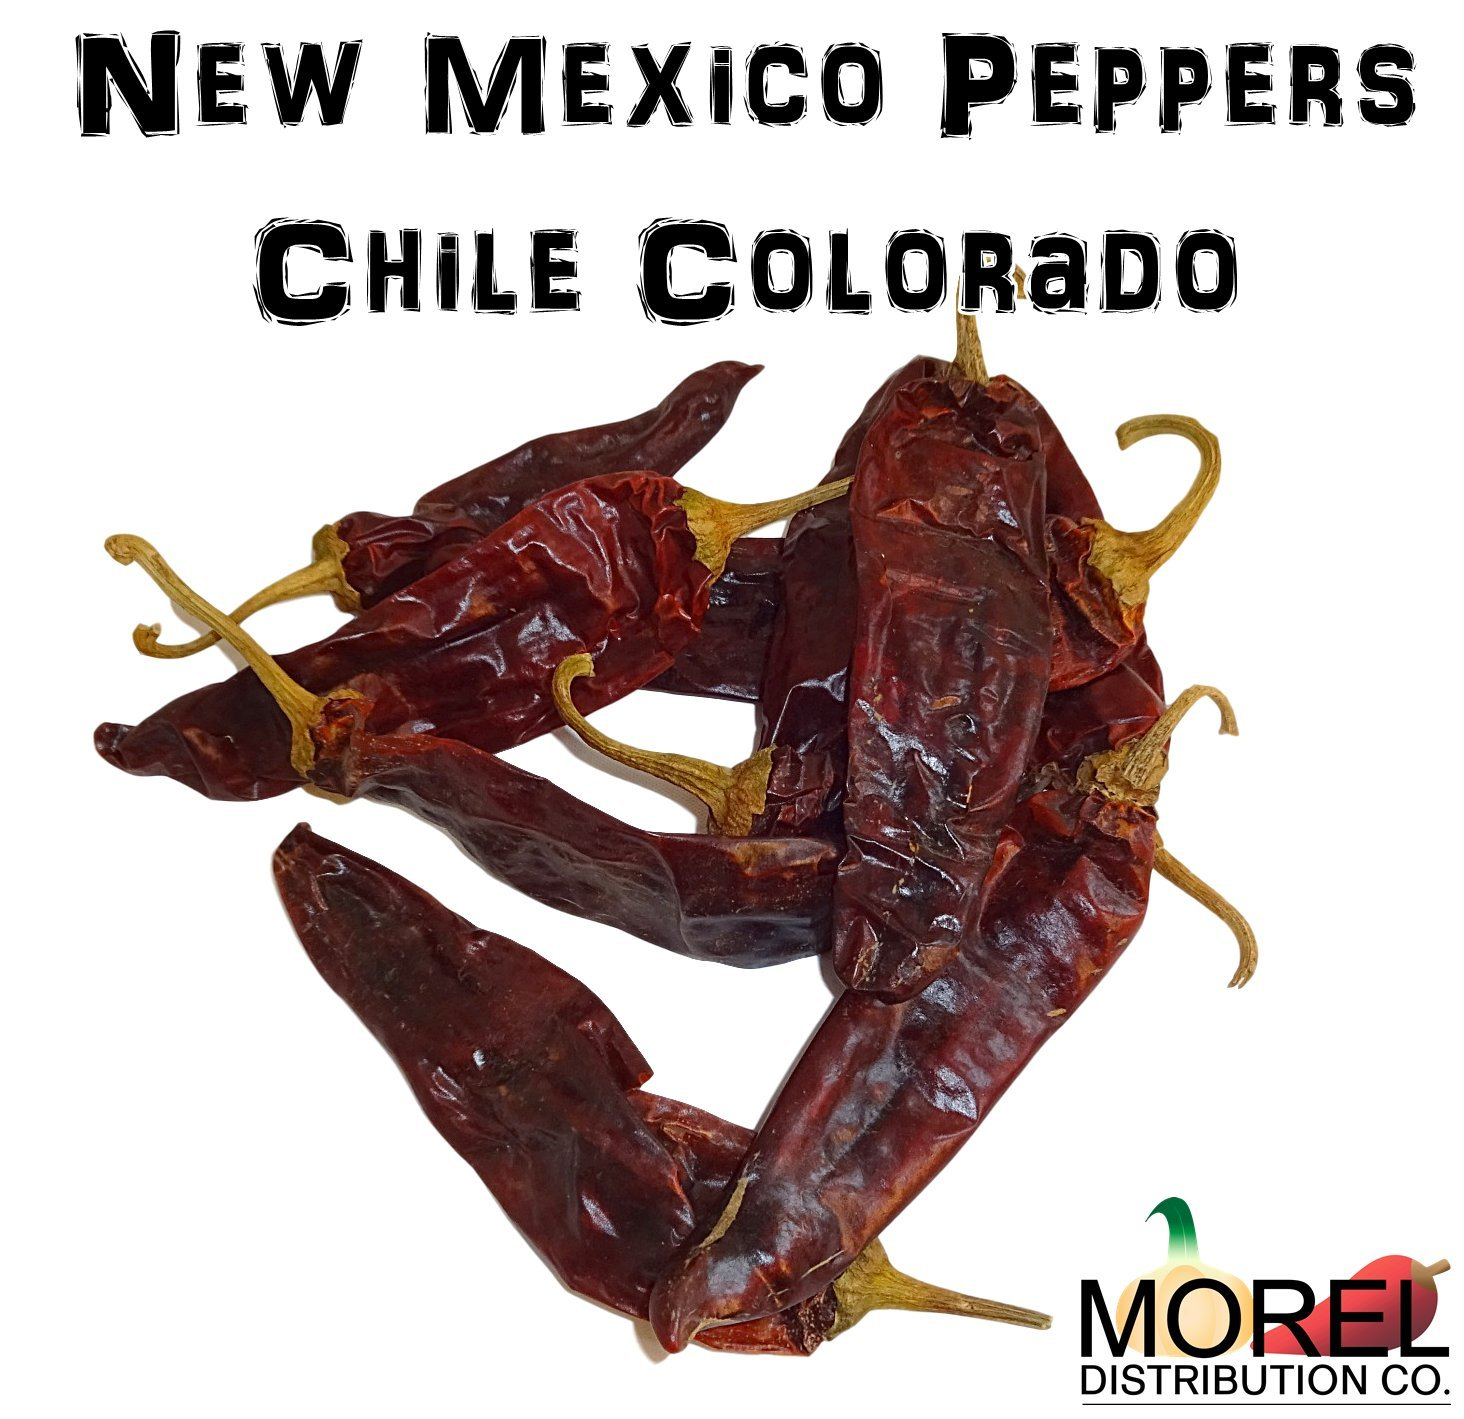 Dried New Mexico Chile (Chile Colorado) / Weights: 4 Oz, 8 Oz, 12 Oz, 1 Lb (1 lb)